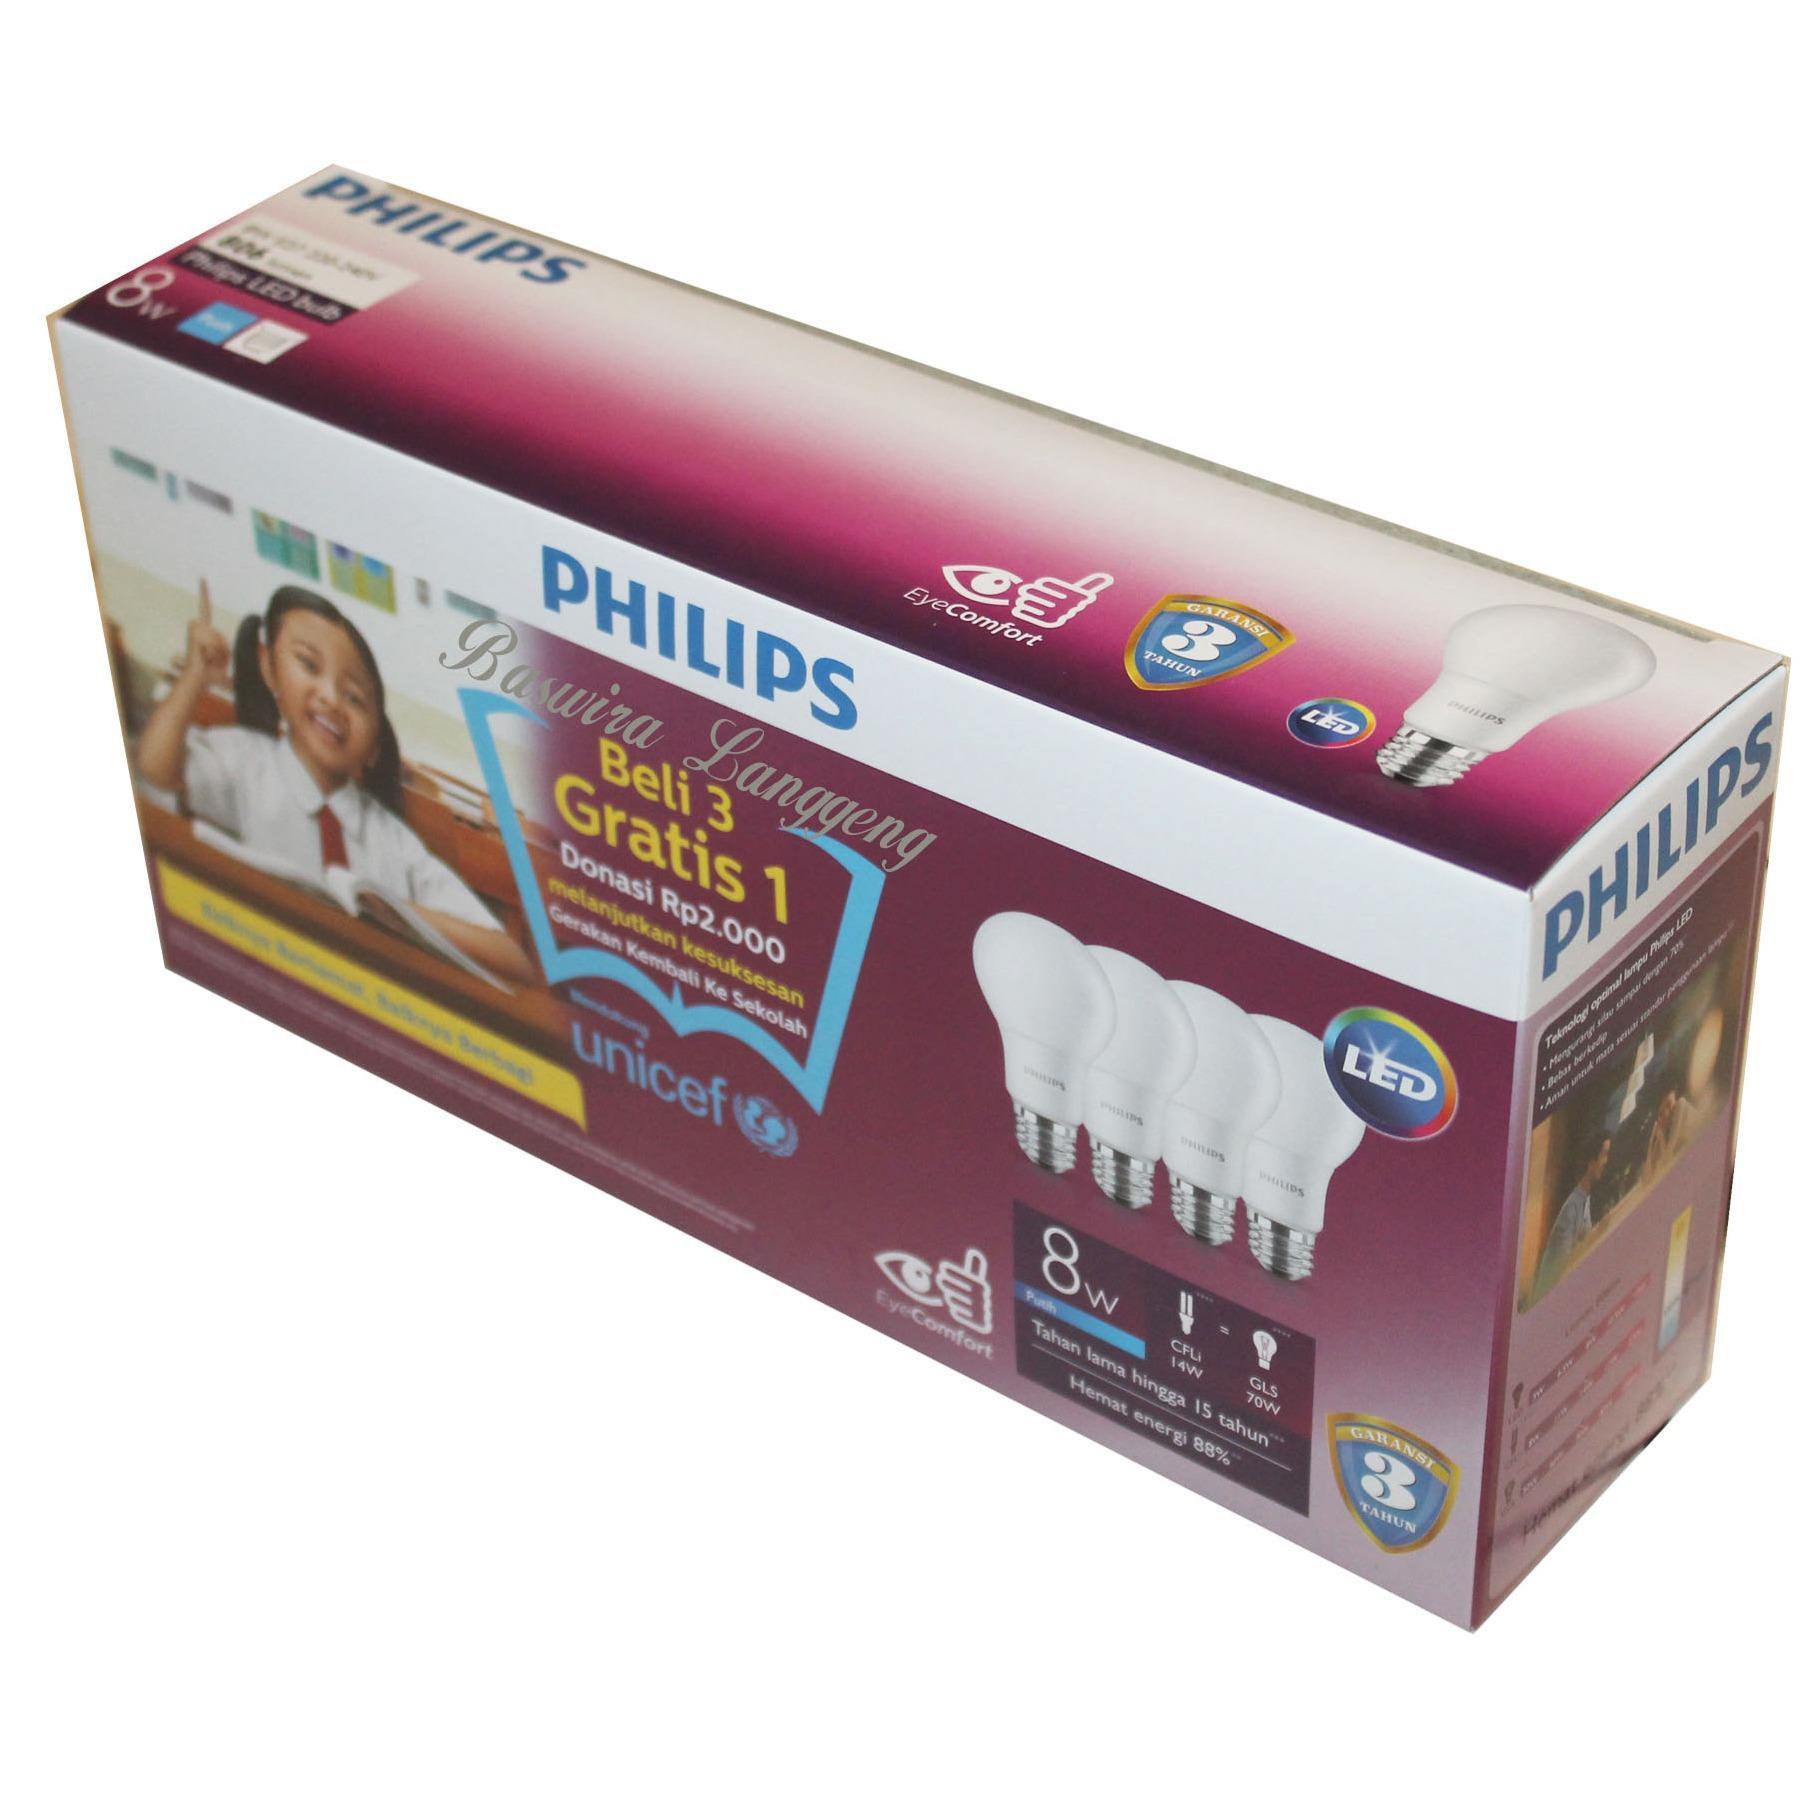 Cek Harga Baru Bundling Philips Lampu Led Bulb 8 Watt Unicef Beli 3 Ledbulb 70w E27 3000k 230v Kuning 8w Paket Gratis 1 Putih 4